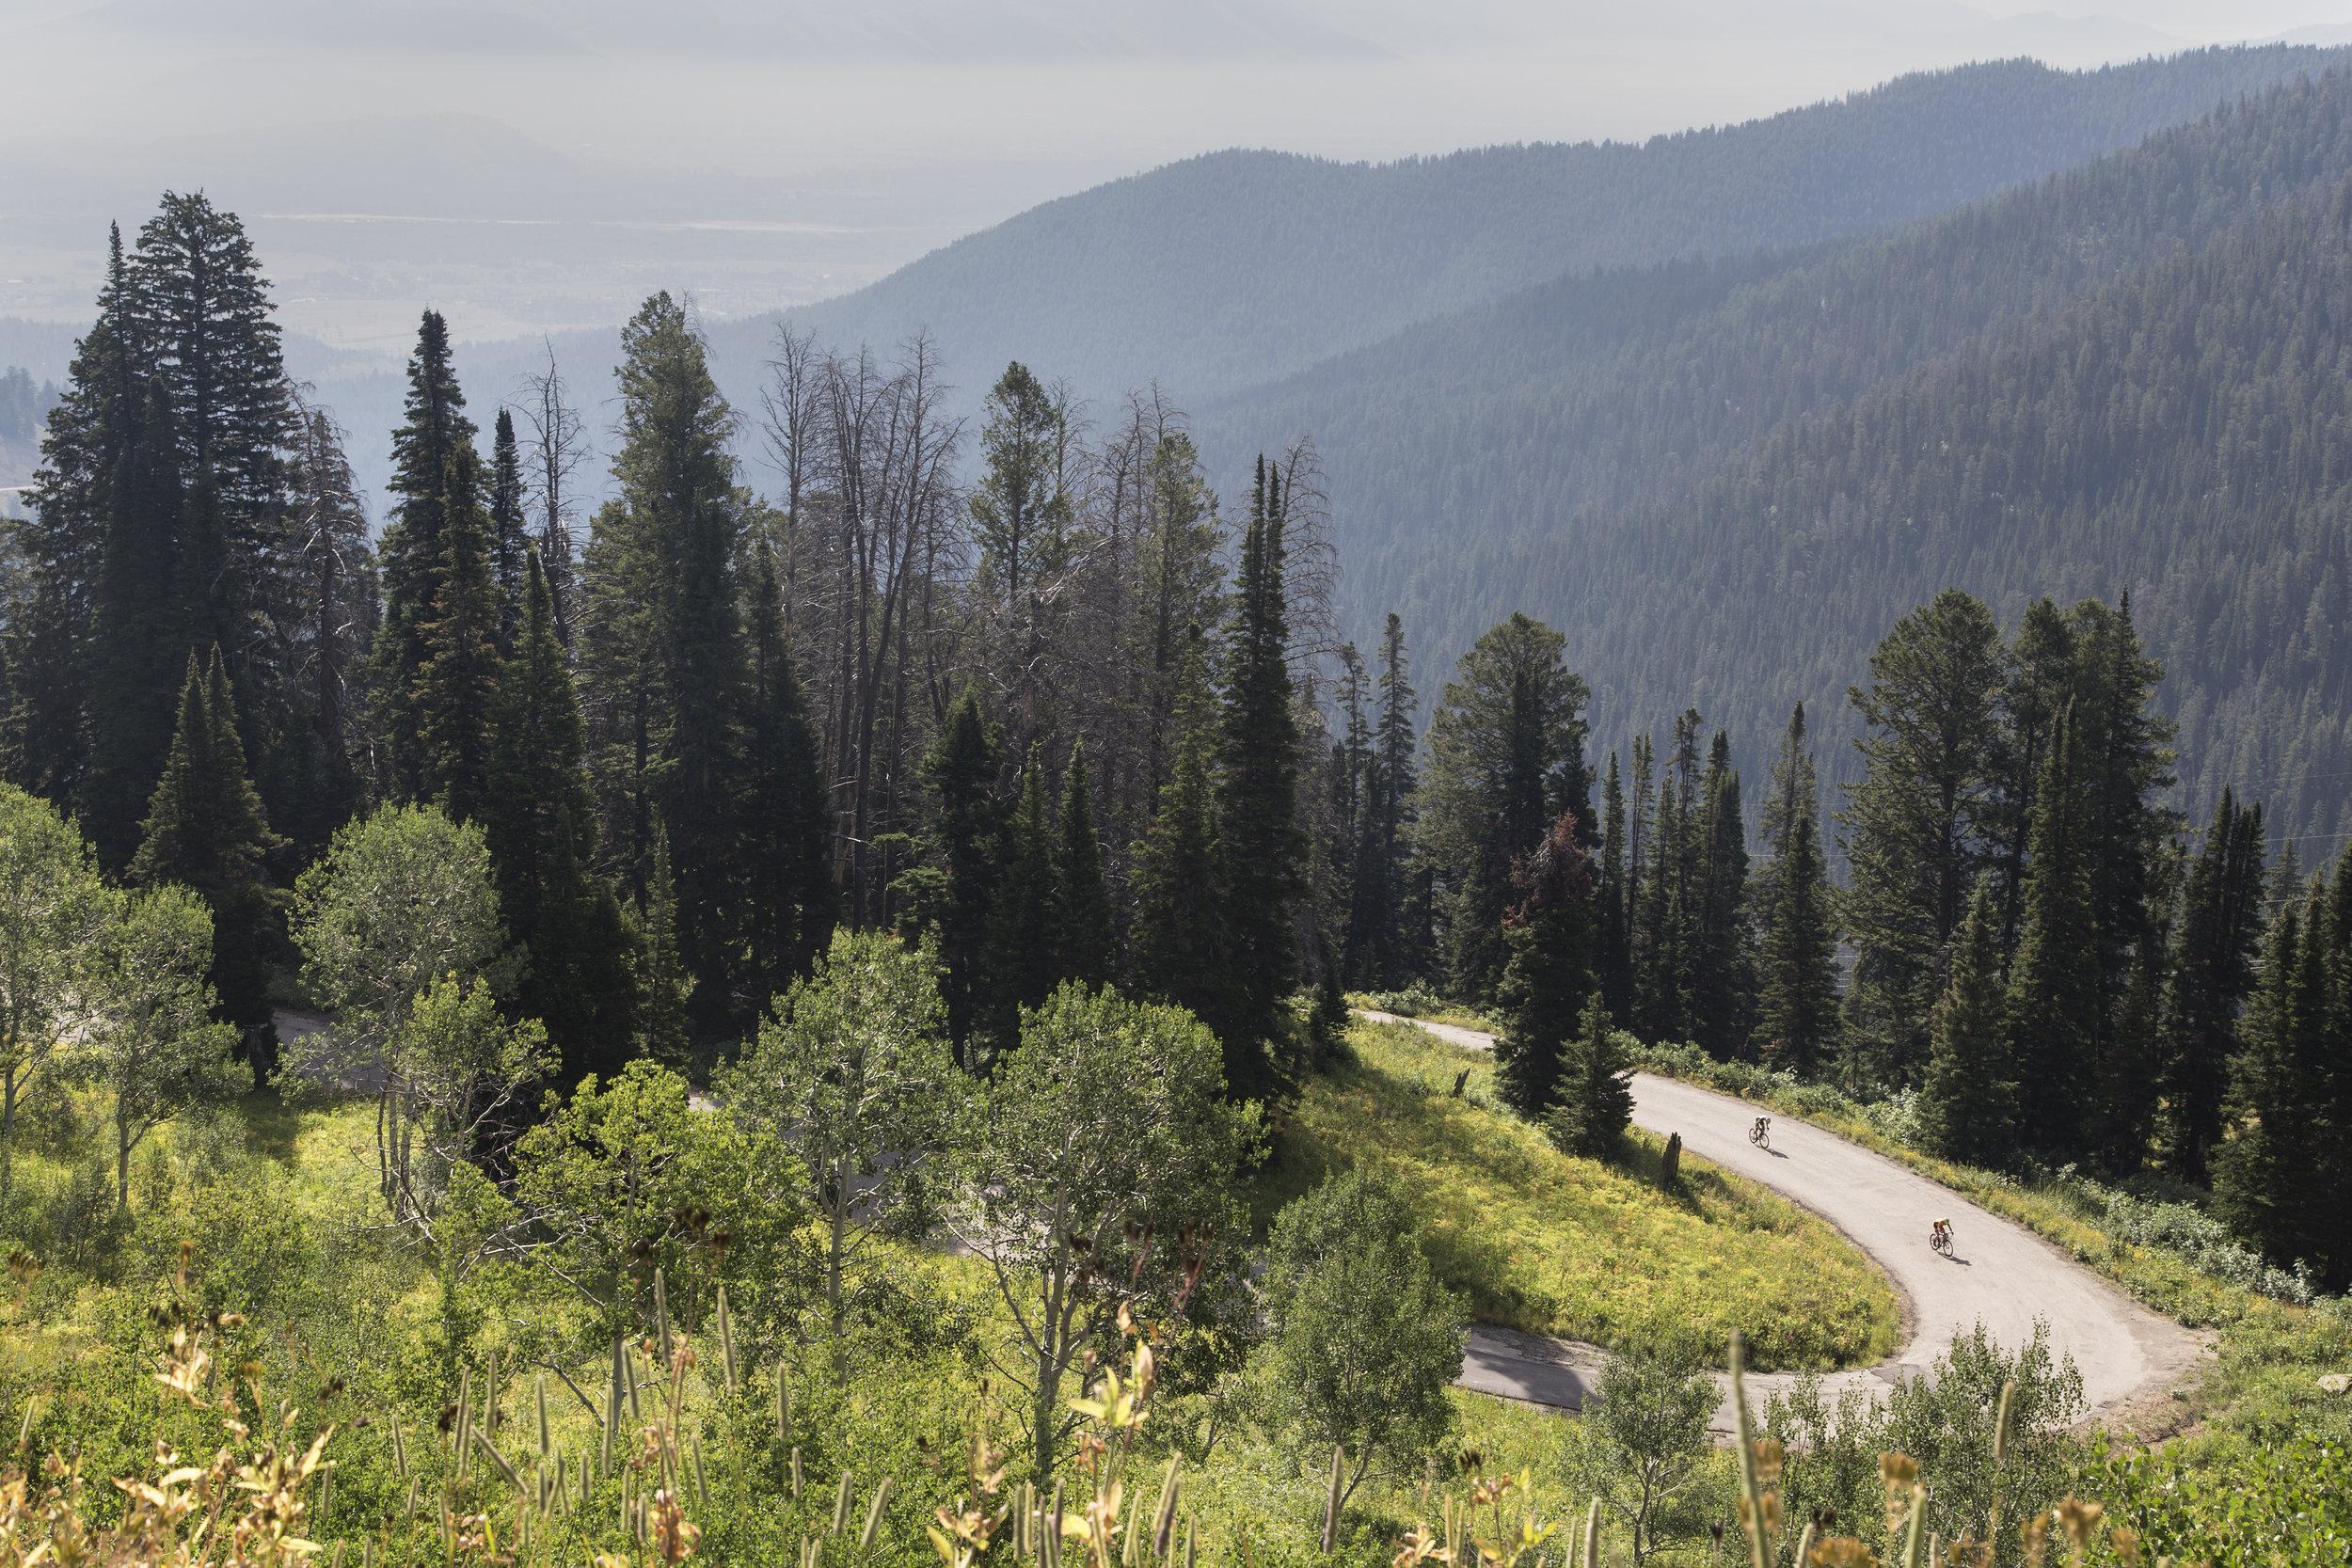 20160802 d teton pass hill climb.jpg